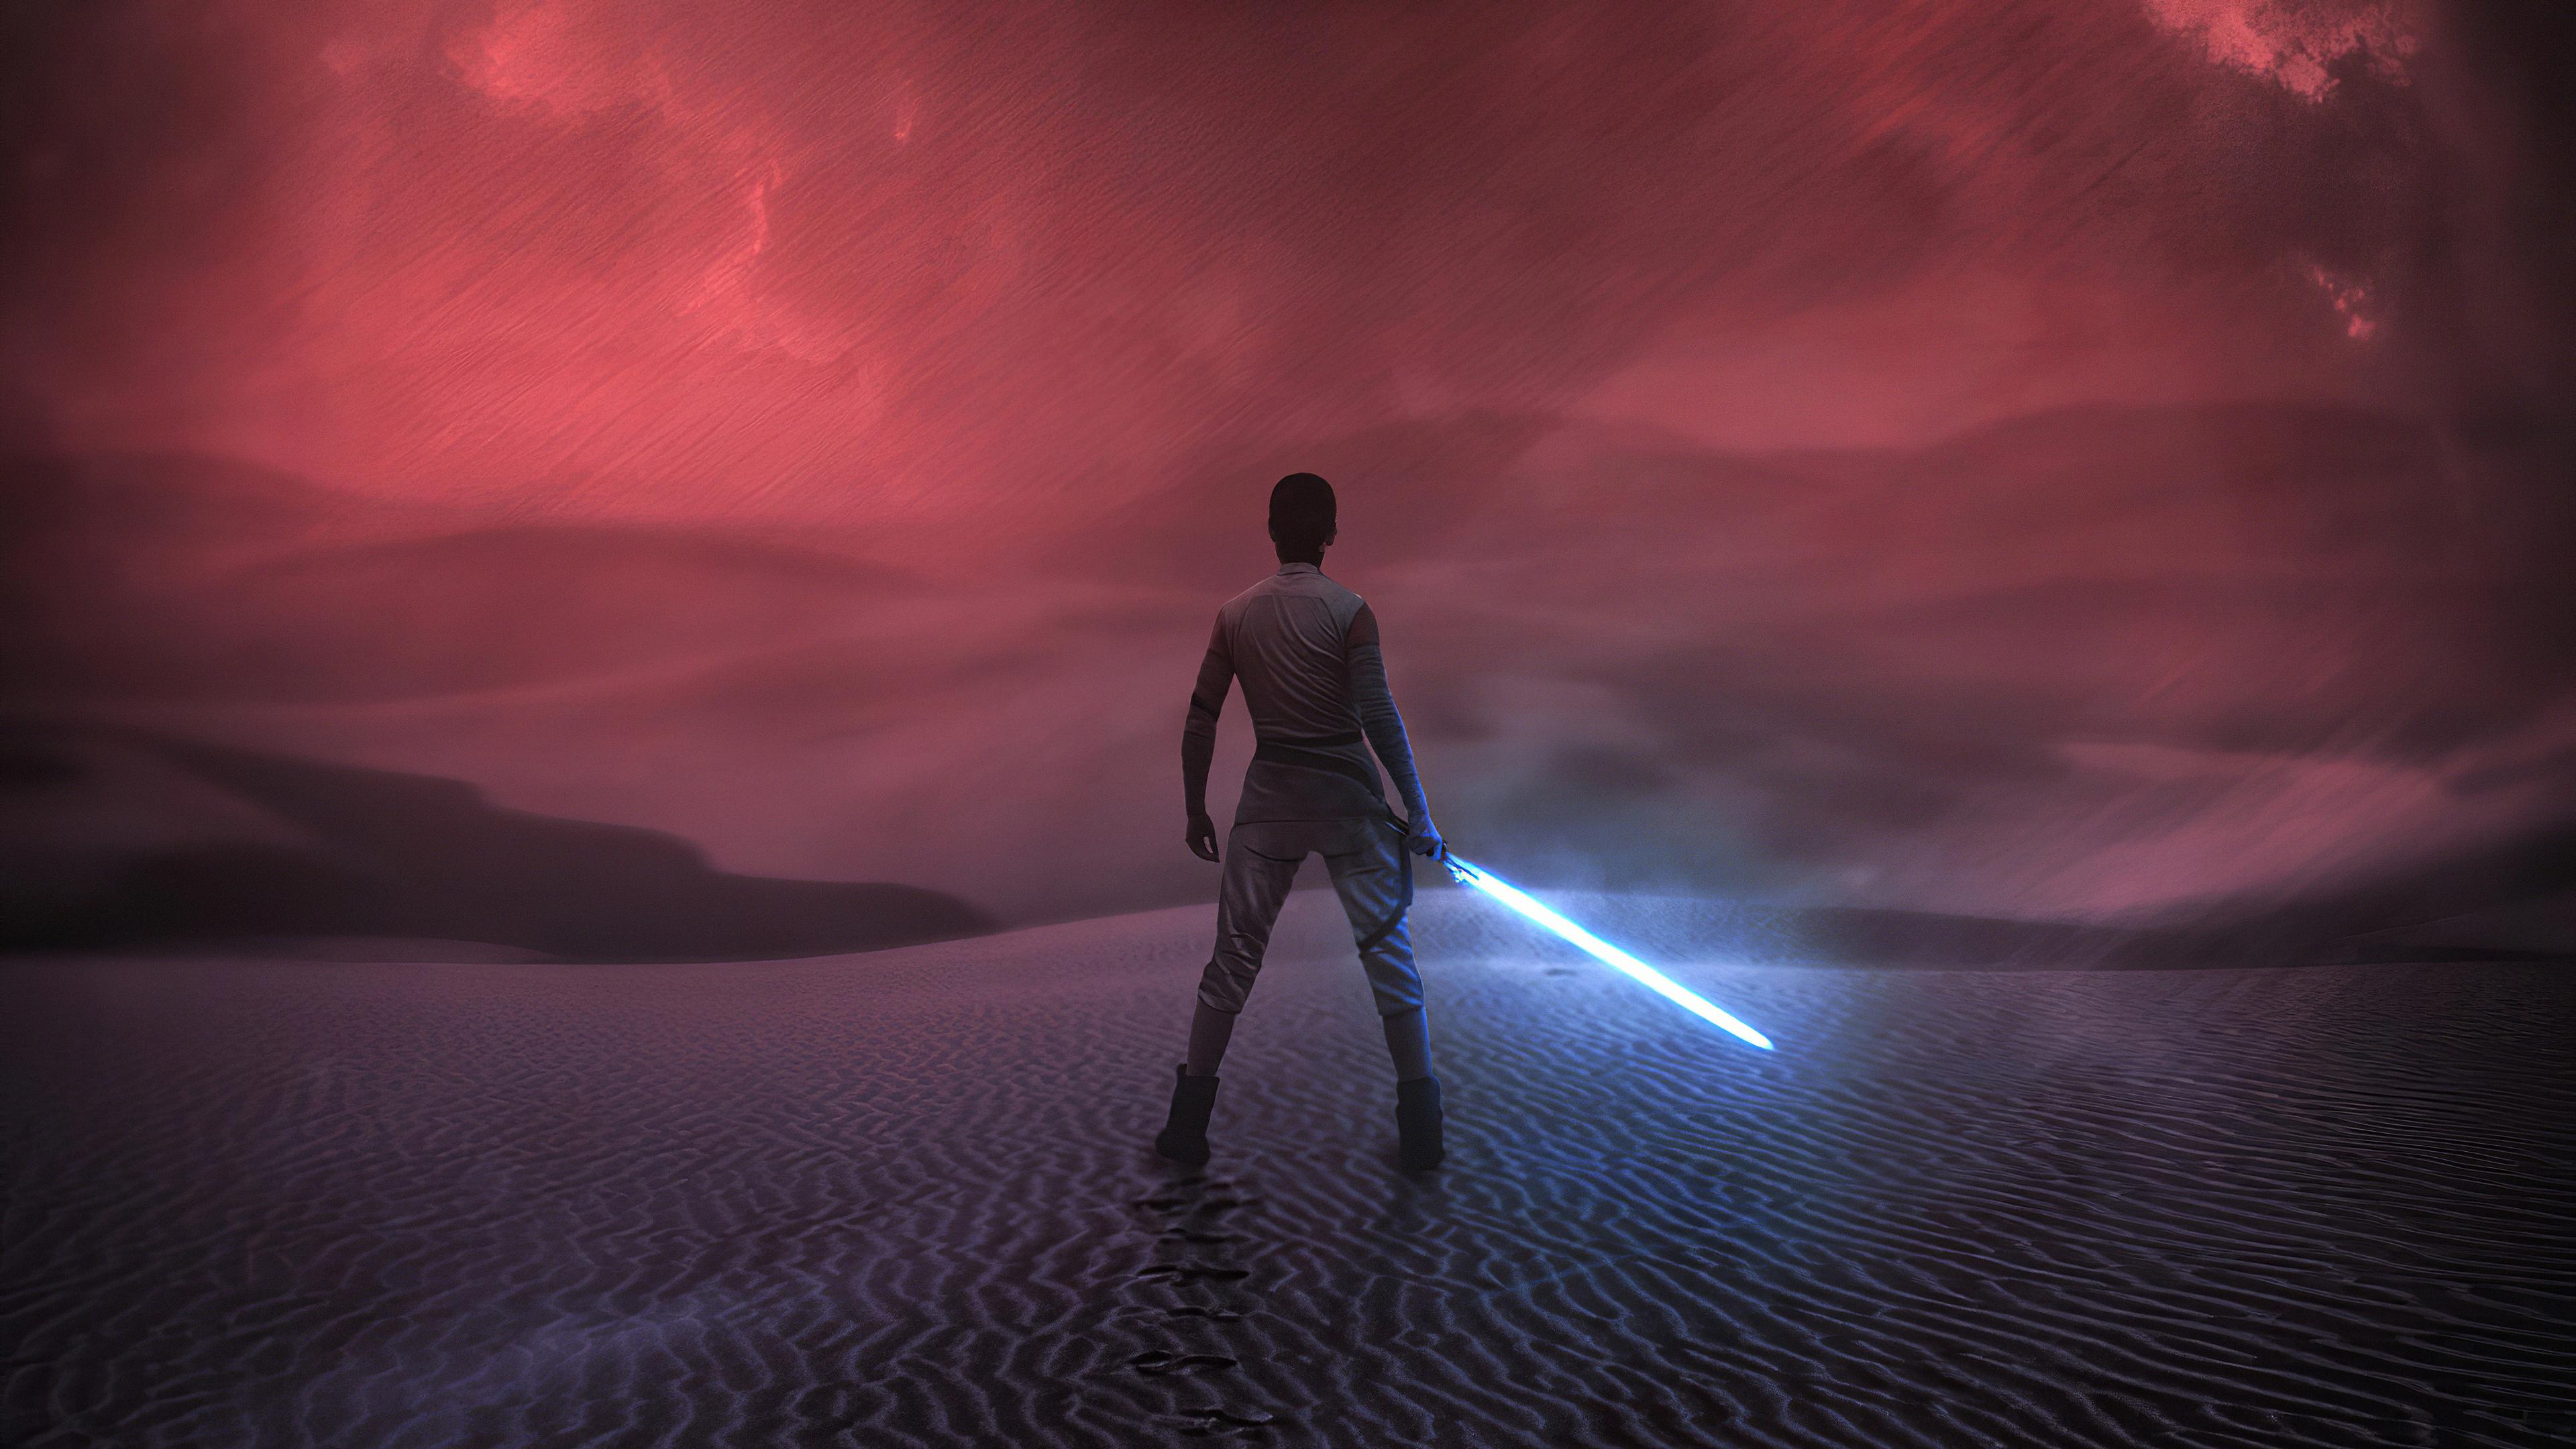 star wars the rise of skywalker rey 1578256089 - Star Wars The Rise Of Skywalker Rey -